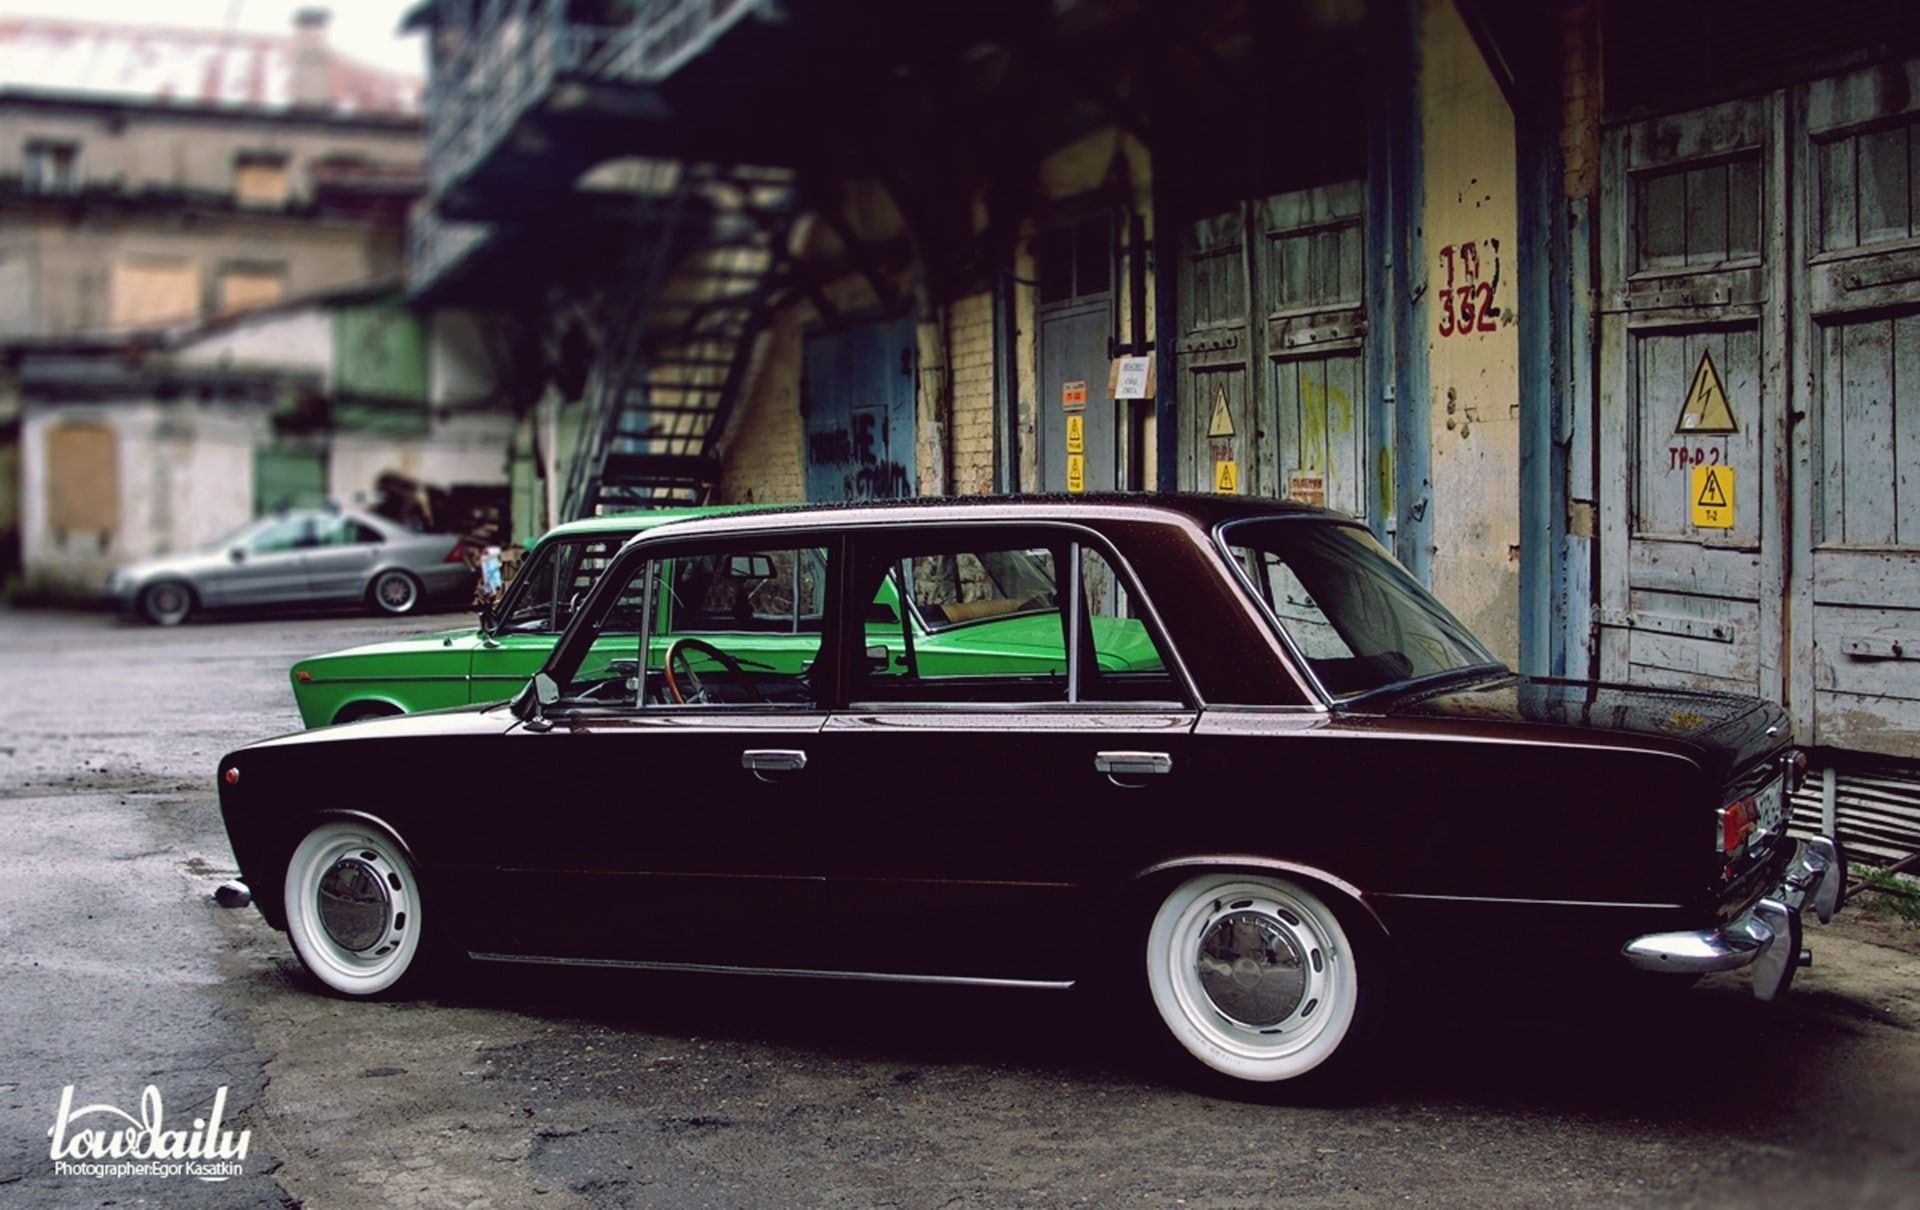 Car Old Car Lada Vaz Lada 2101 Vaz 2101 1080p Wallpaper Hdwallpaper Desktop 2020